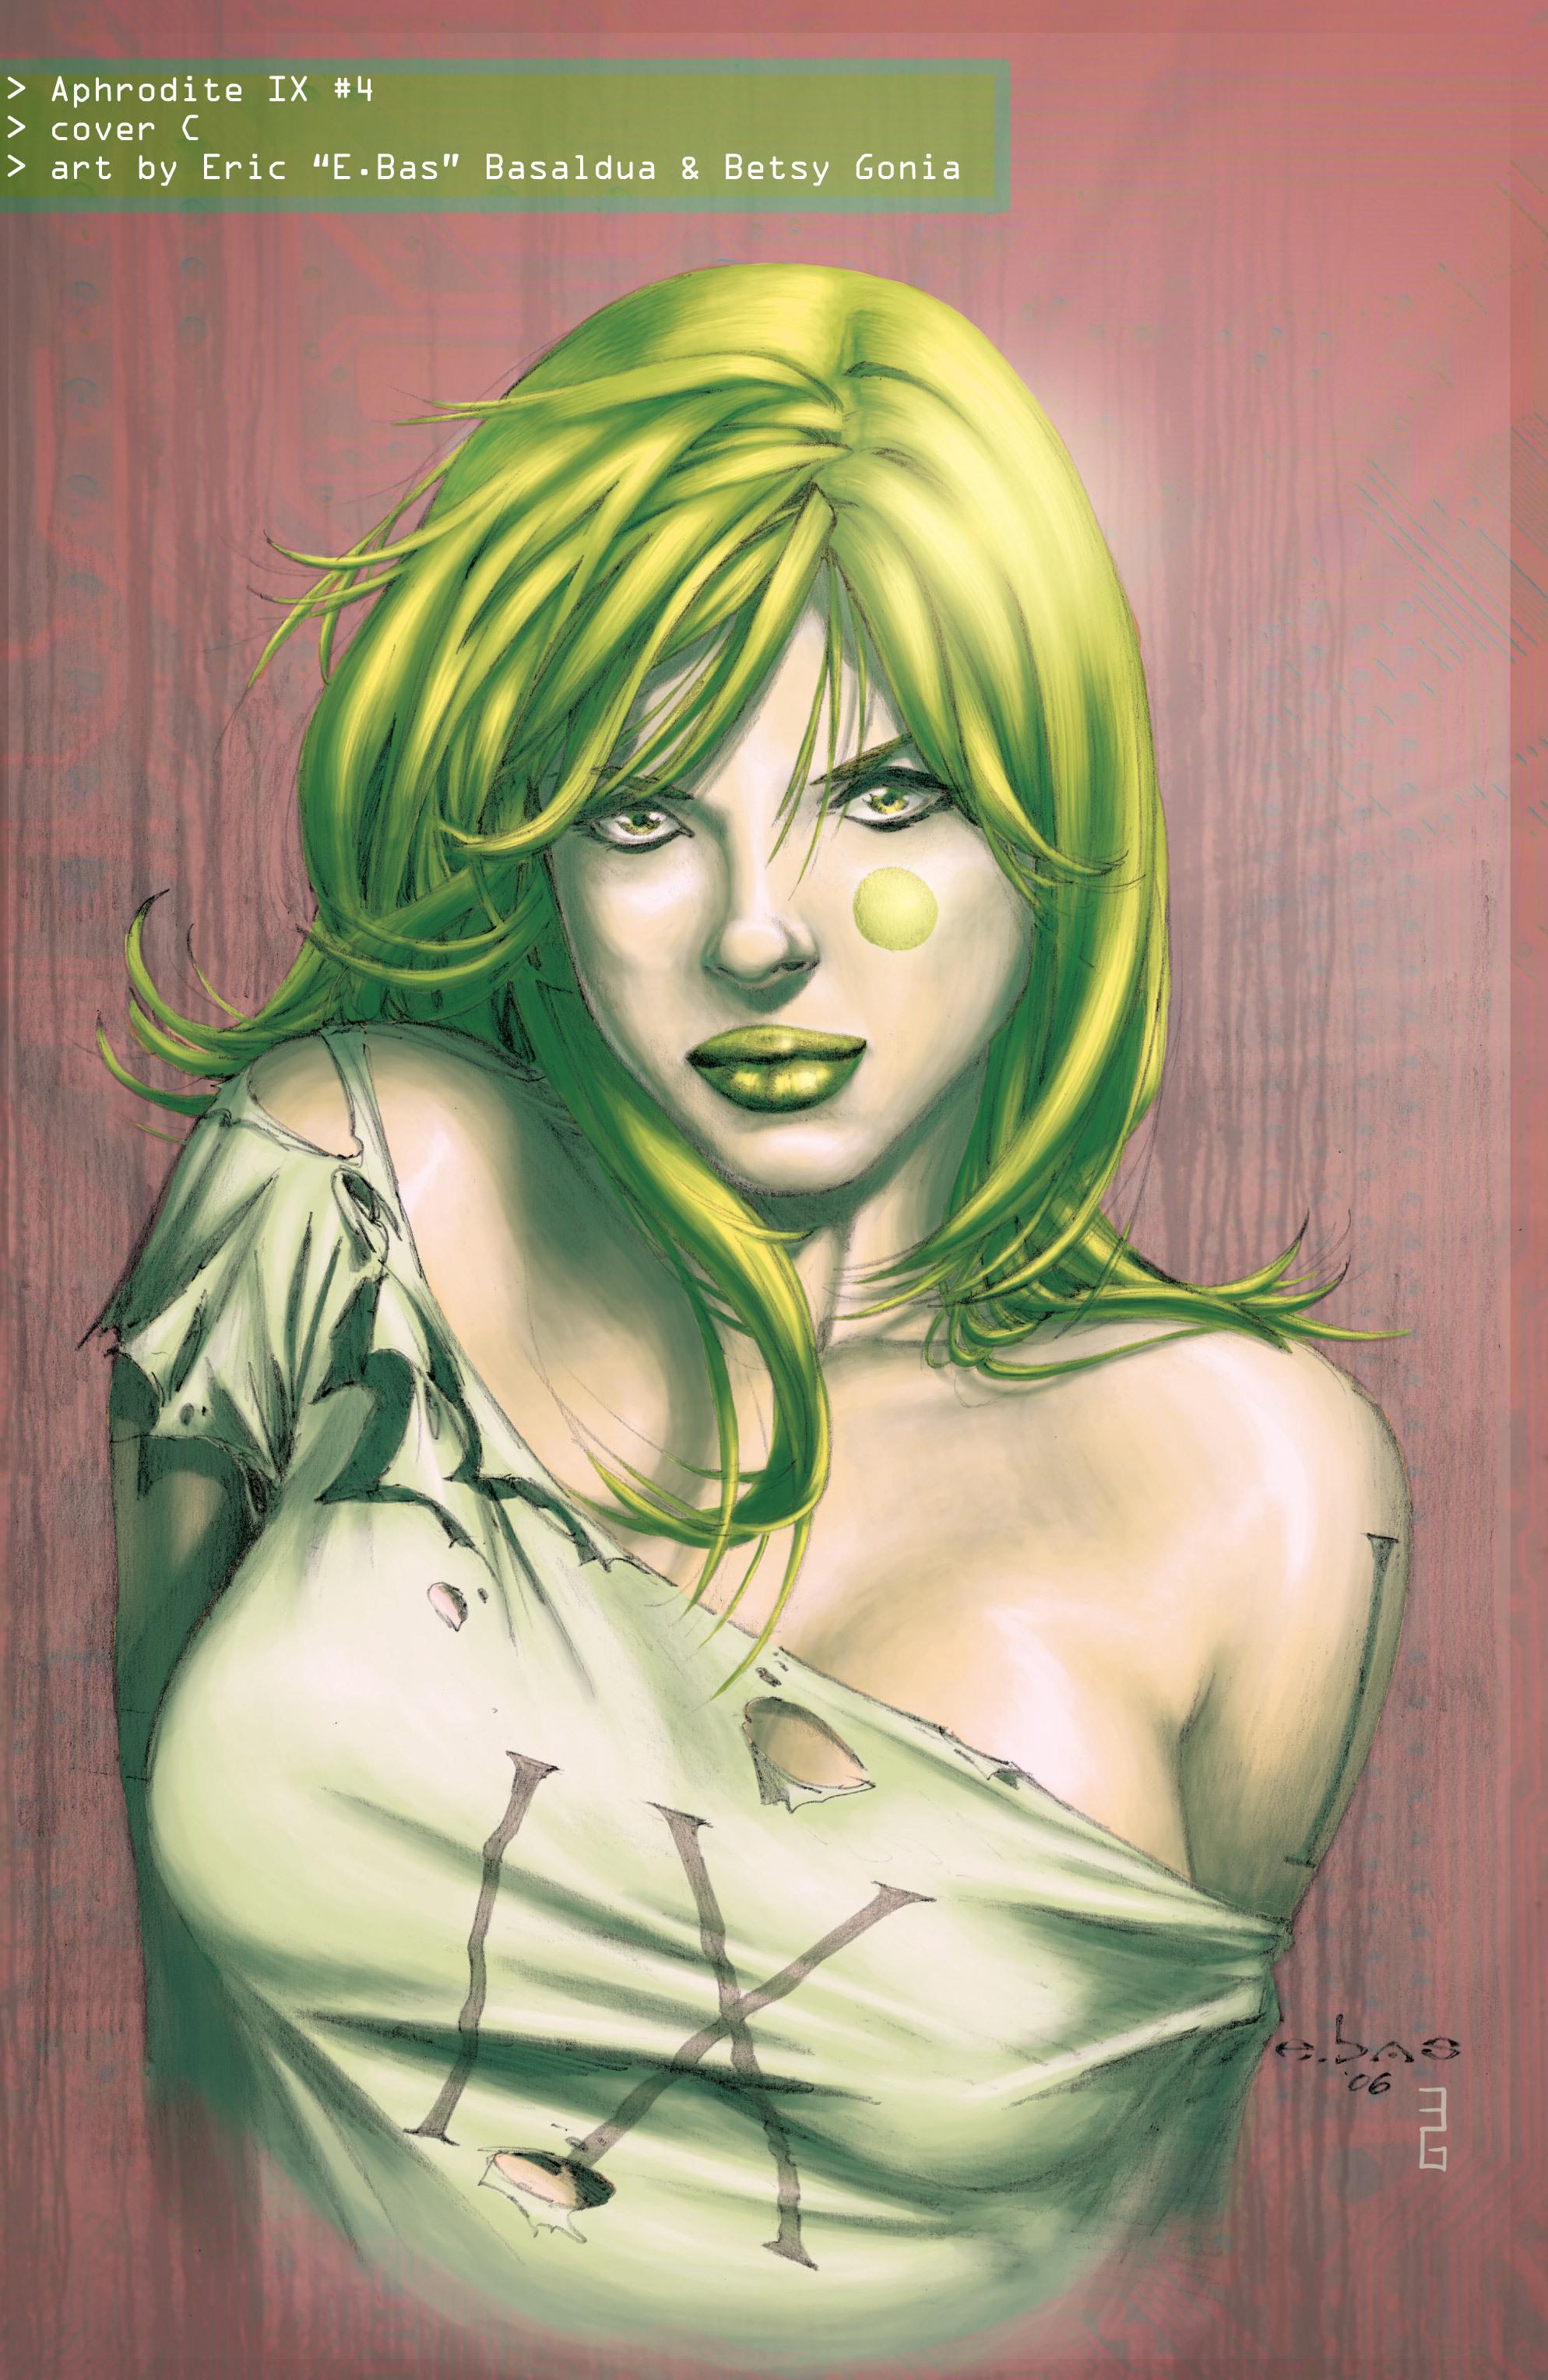 Read online Aphrodite IX (2013) comic -  Issue #Aphrodite IX (2013) _TPB 1 - 118